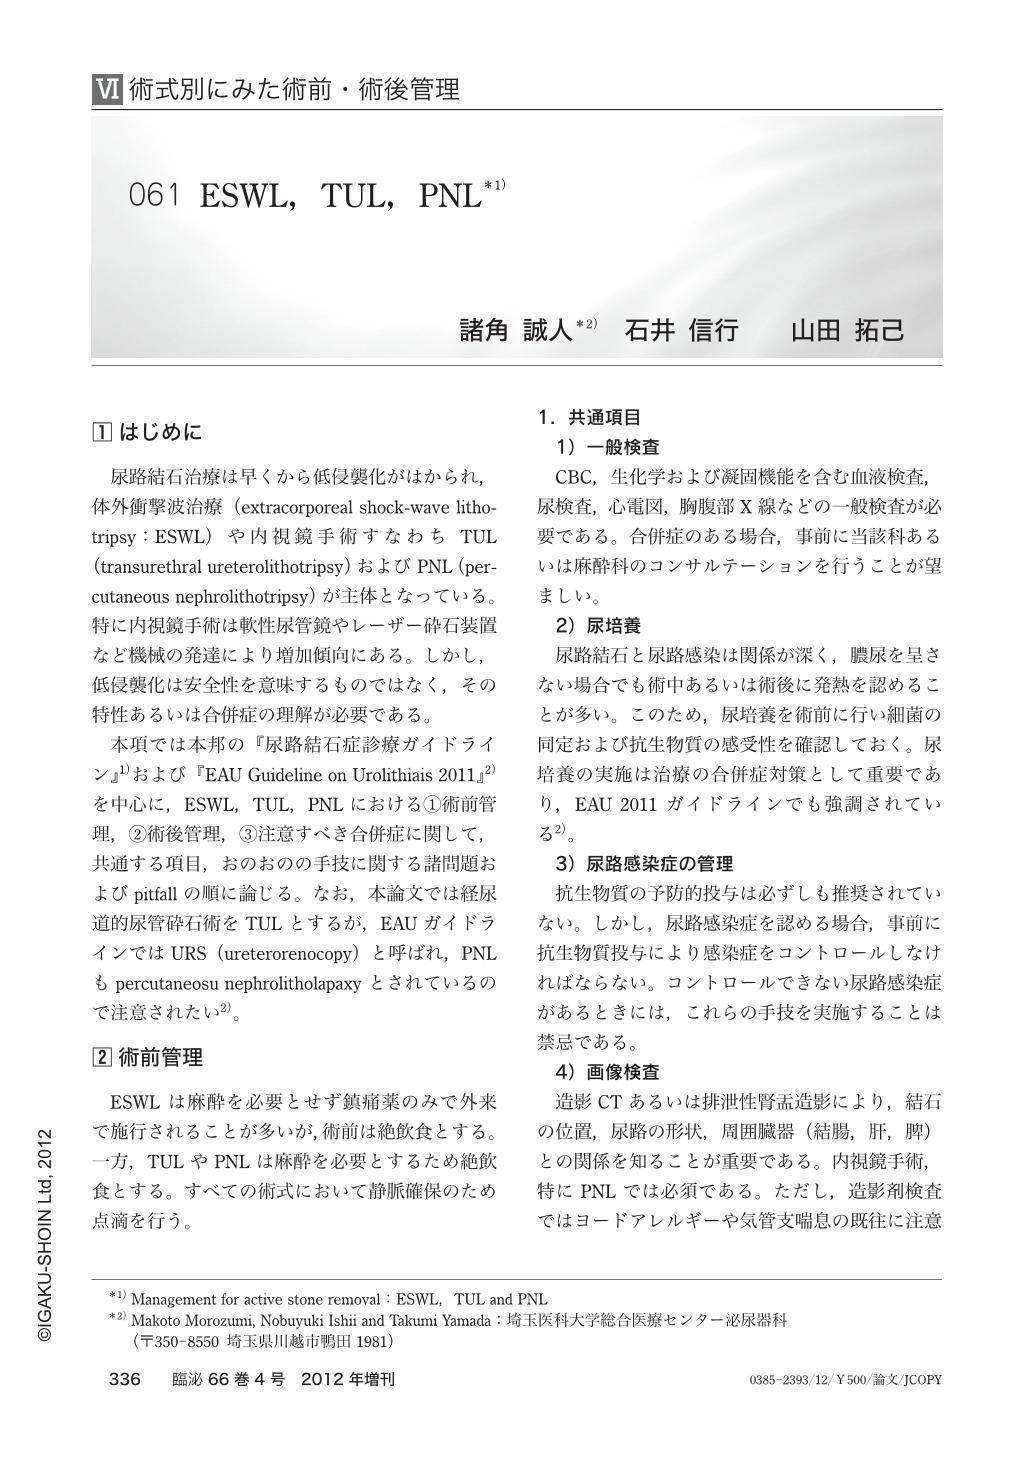 061 eswl tul pnl 臨床泌尿器科 66巻4号 医書 jp